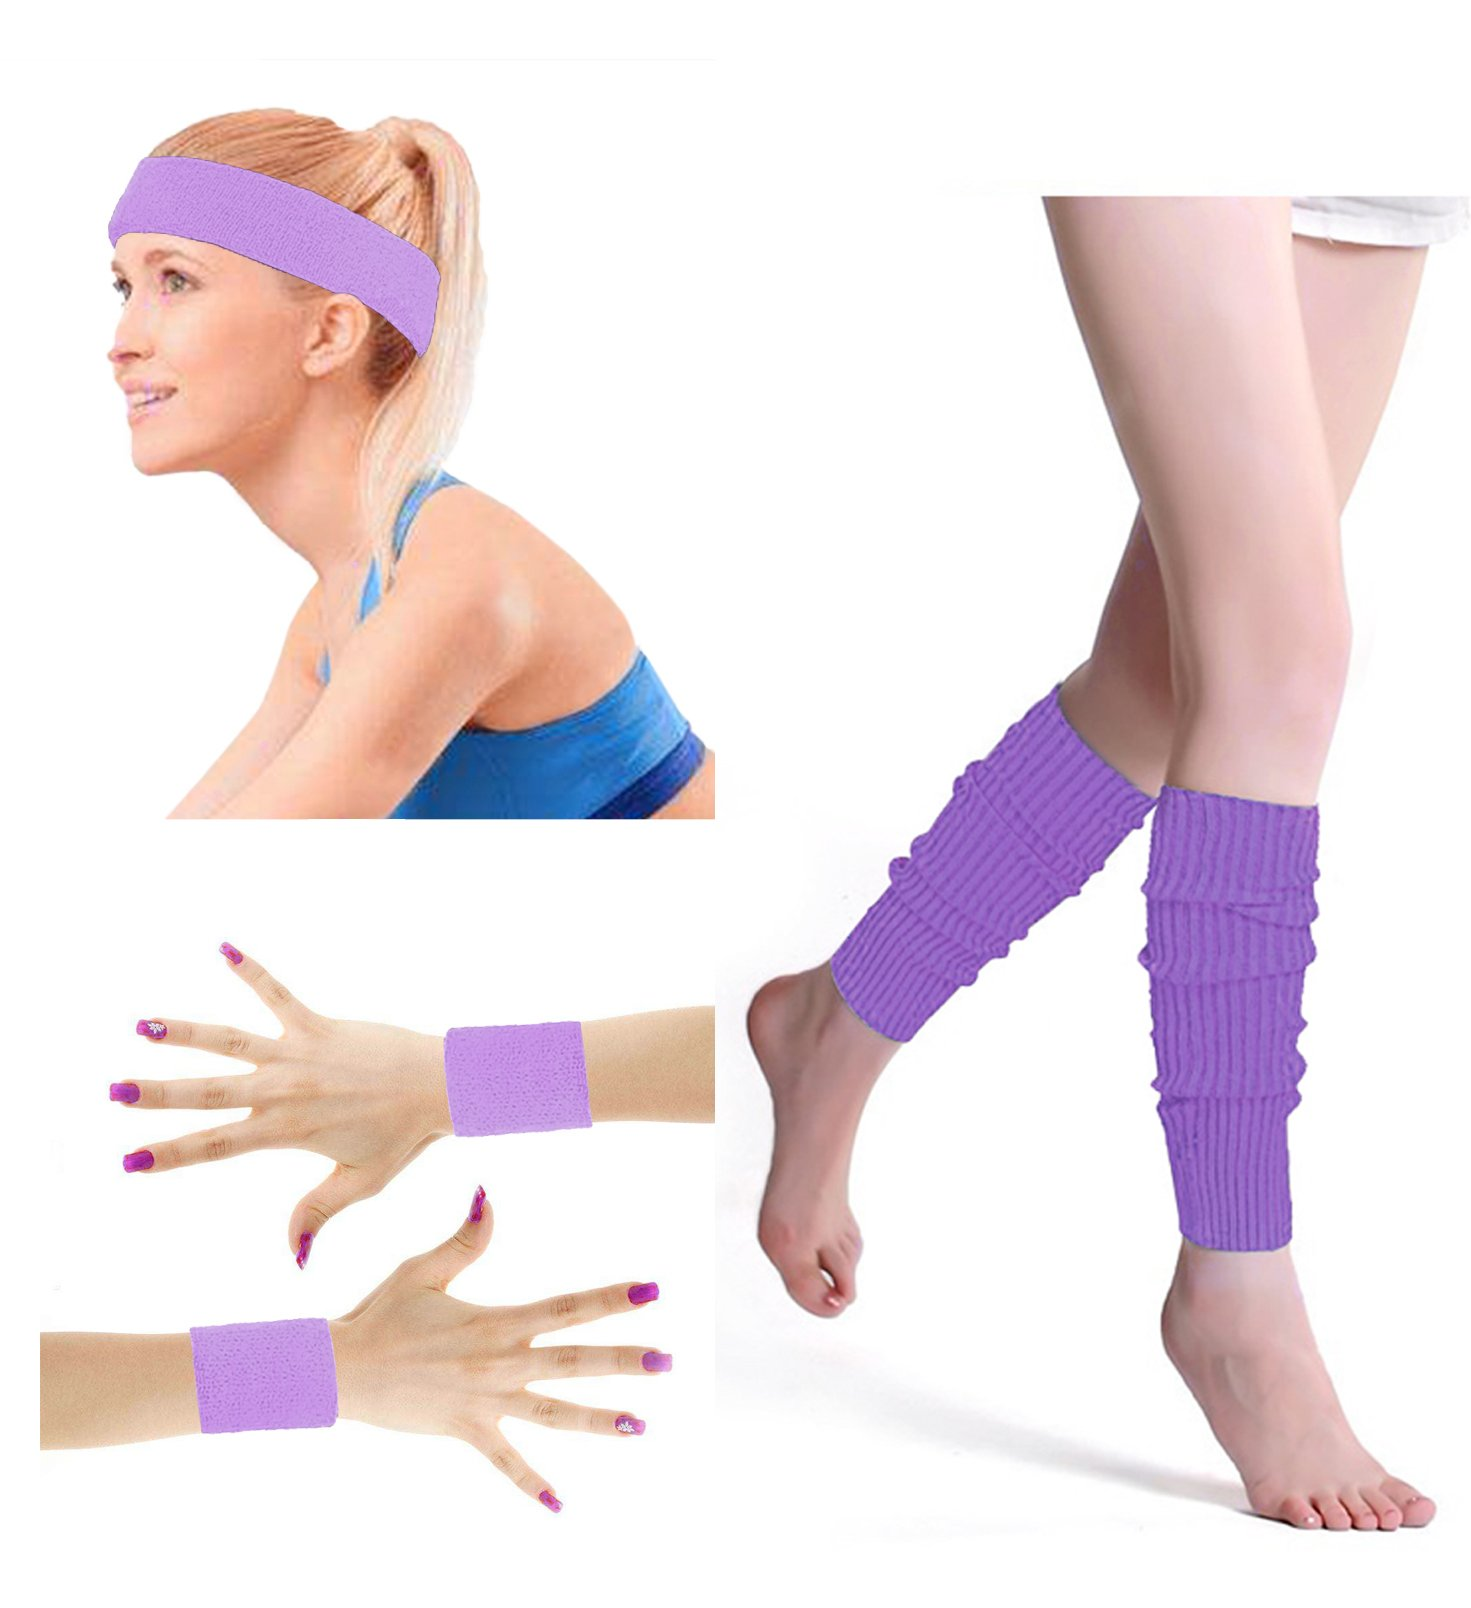 80's Retro Running Jogging Sports Headband Wristbands Leg Warmers Elbow Guard Set For Women Girls, Light Purple